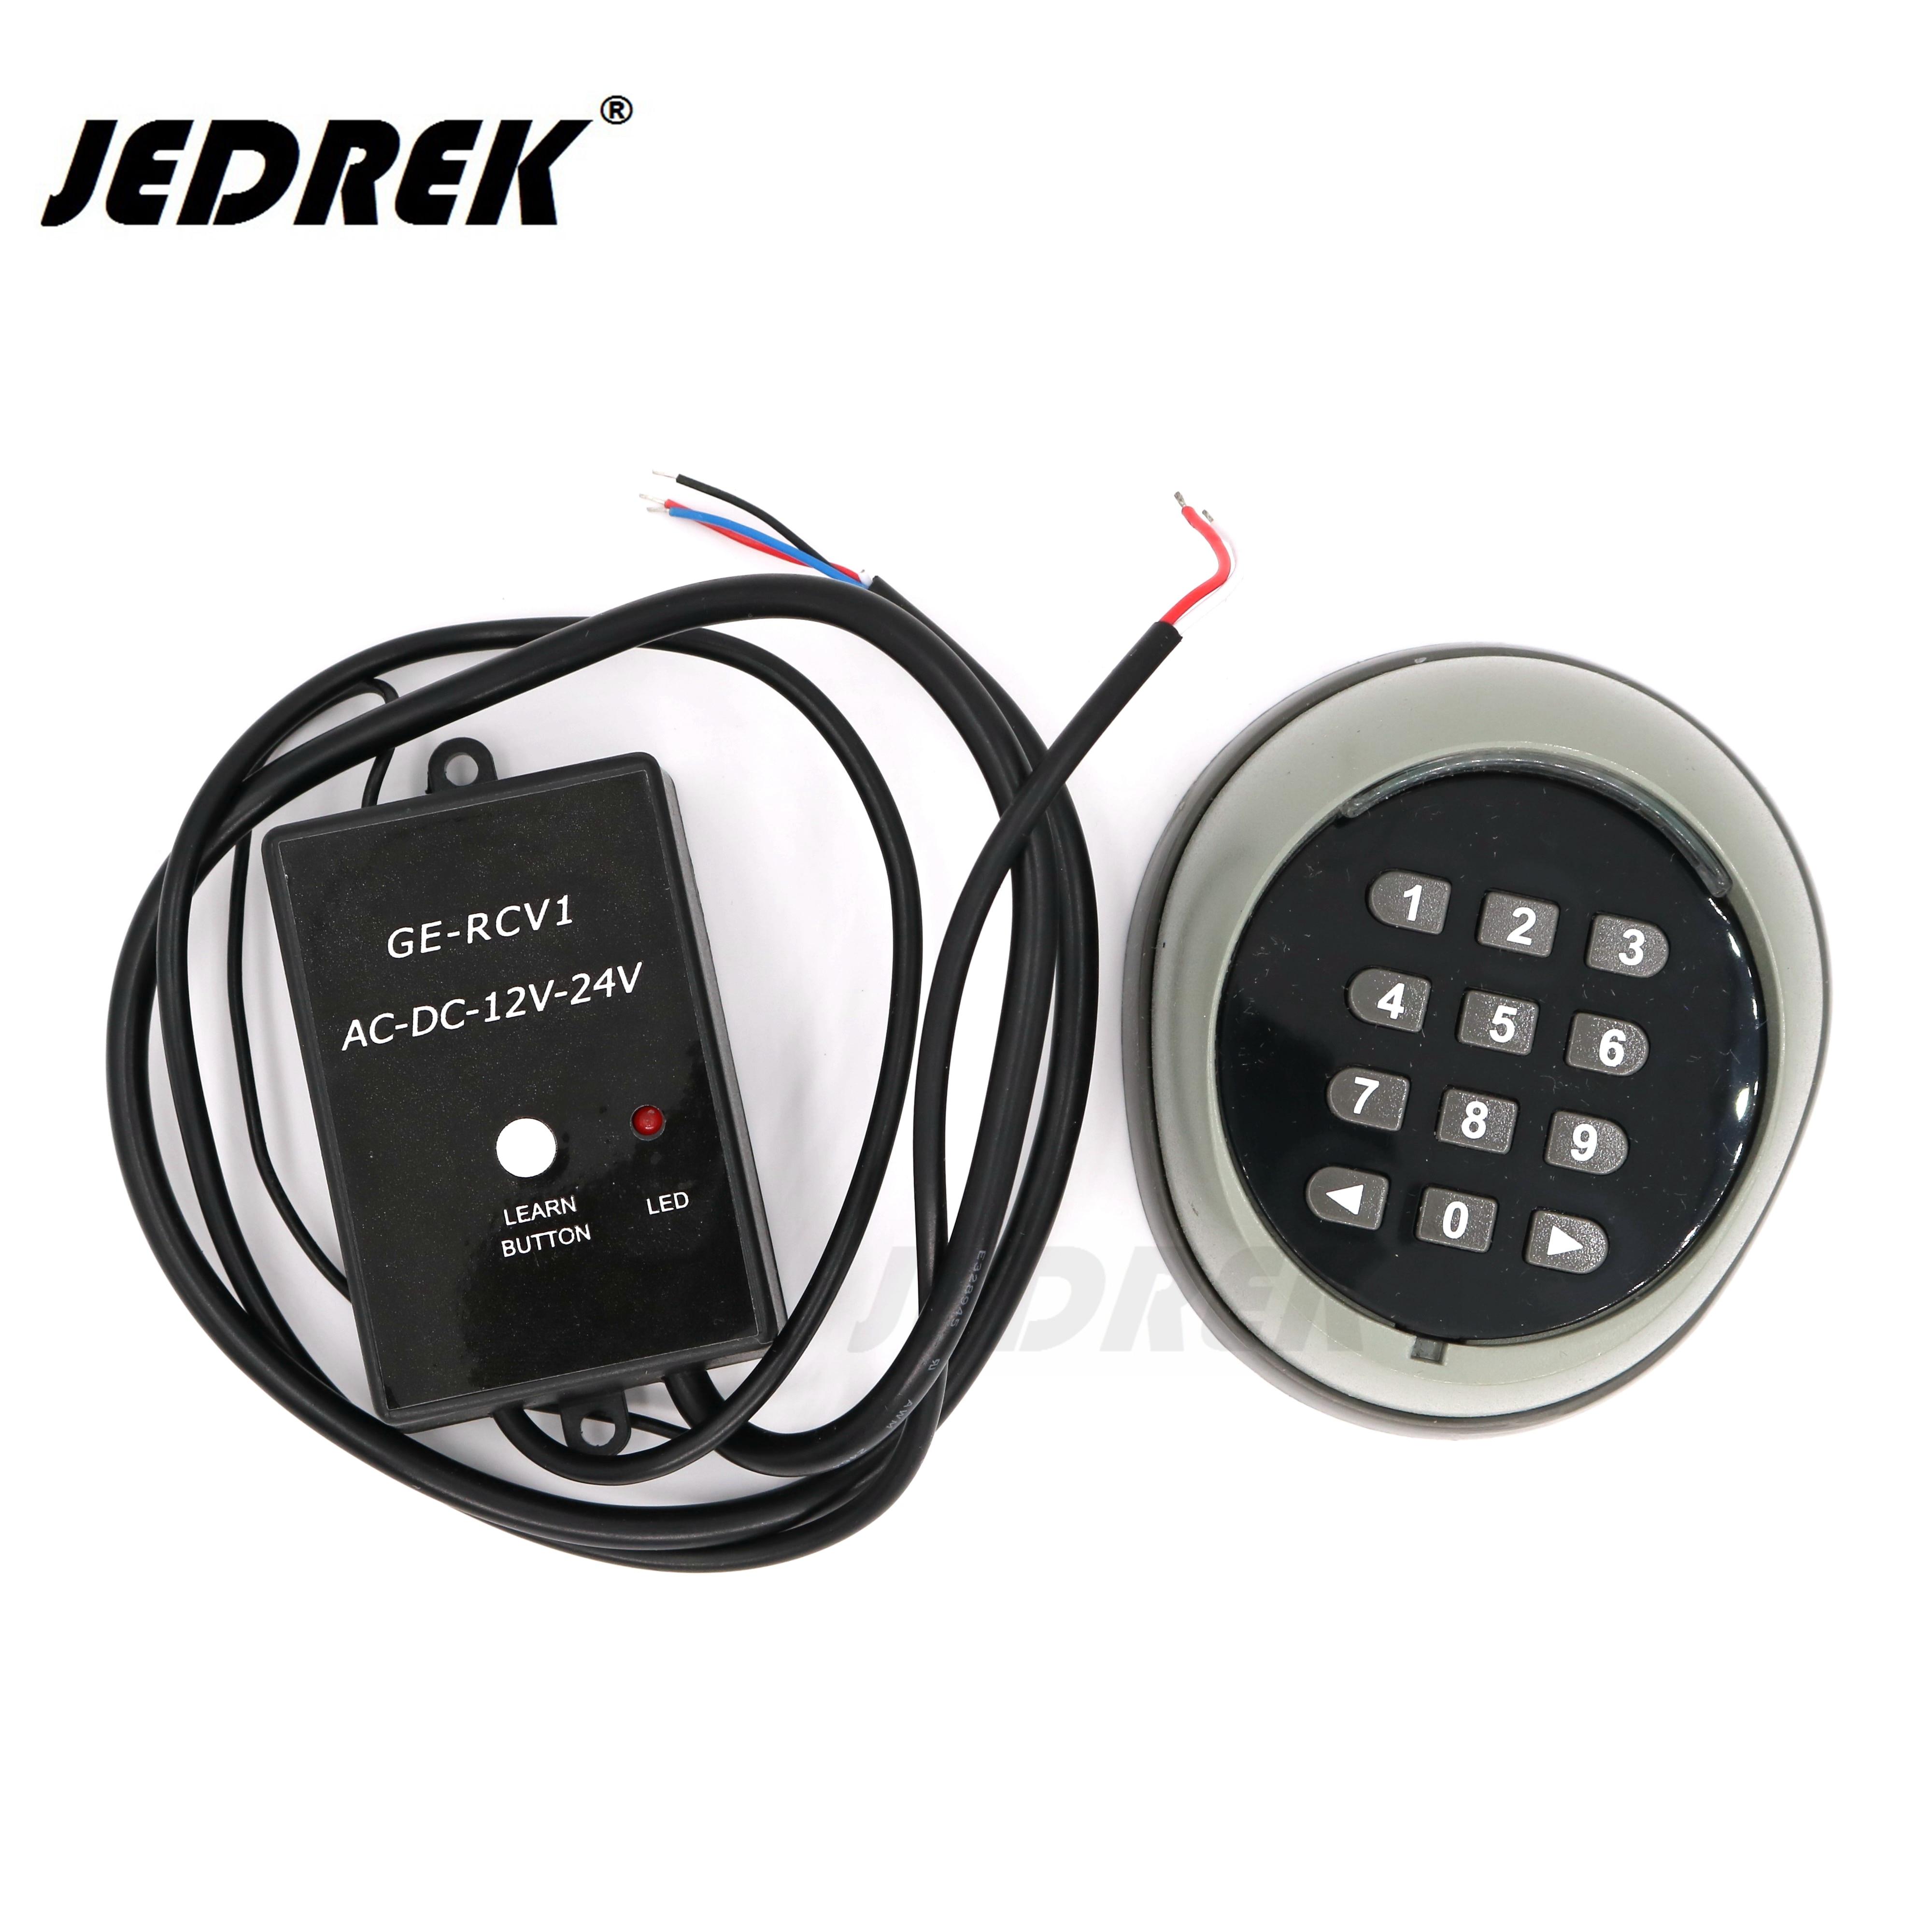 433.92mhz Wireless Remote Keypad Password Switch kit for gate door access control HCS101 Standard Code door gate opener